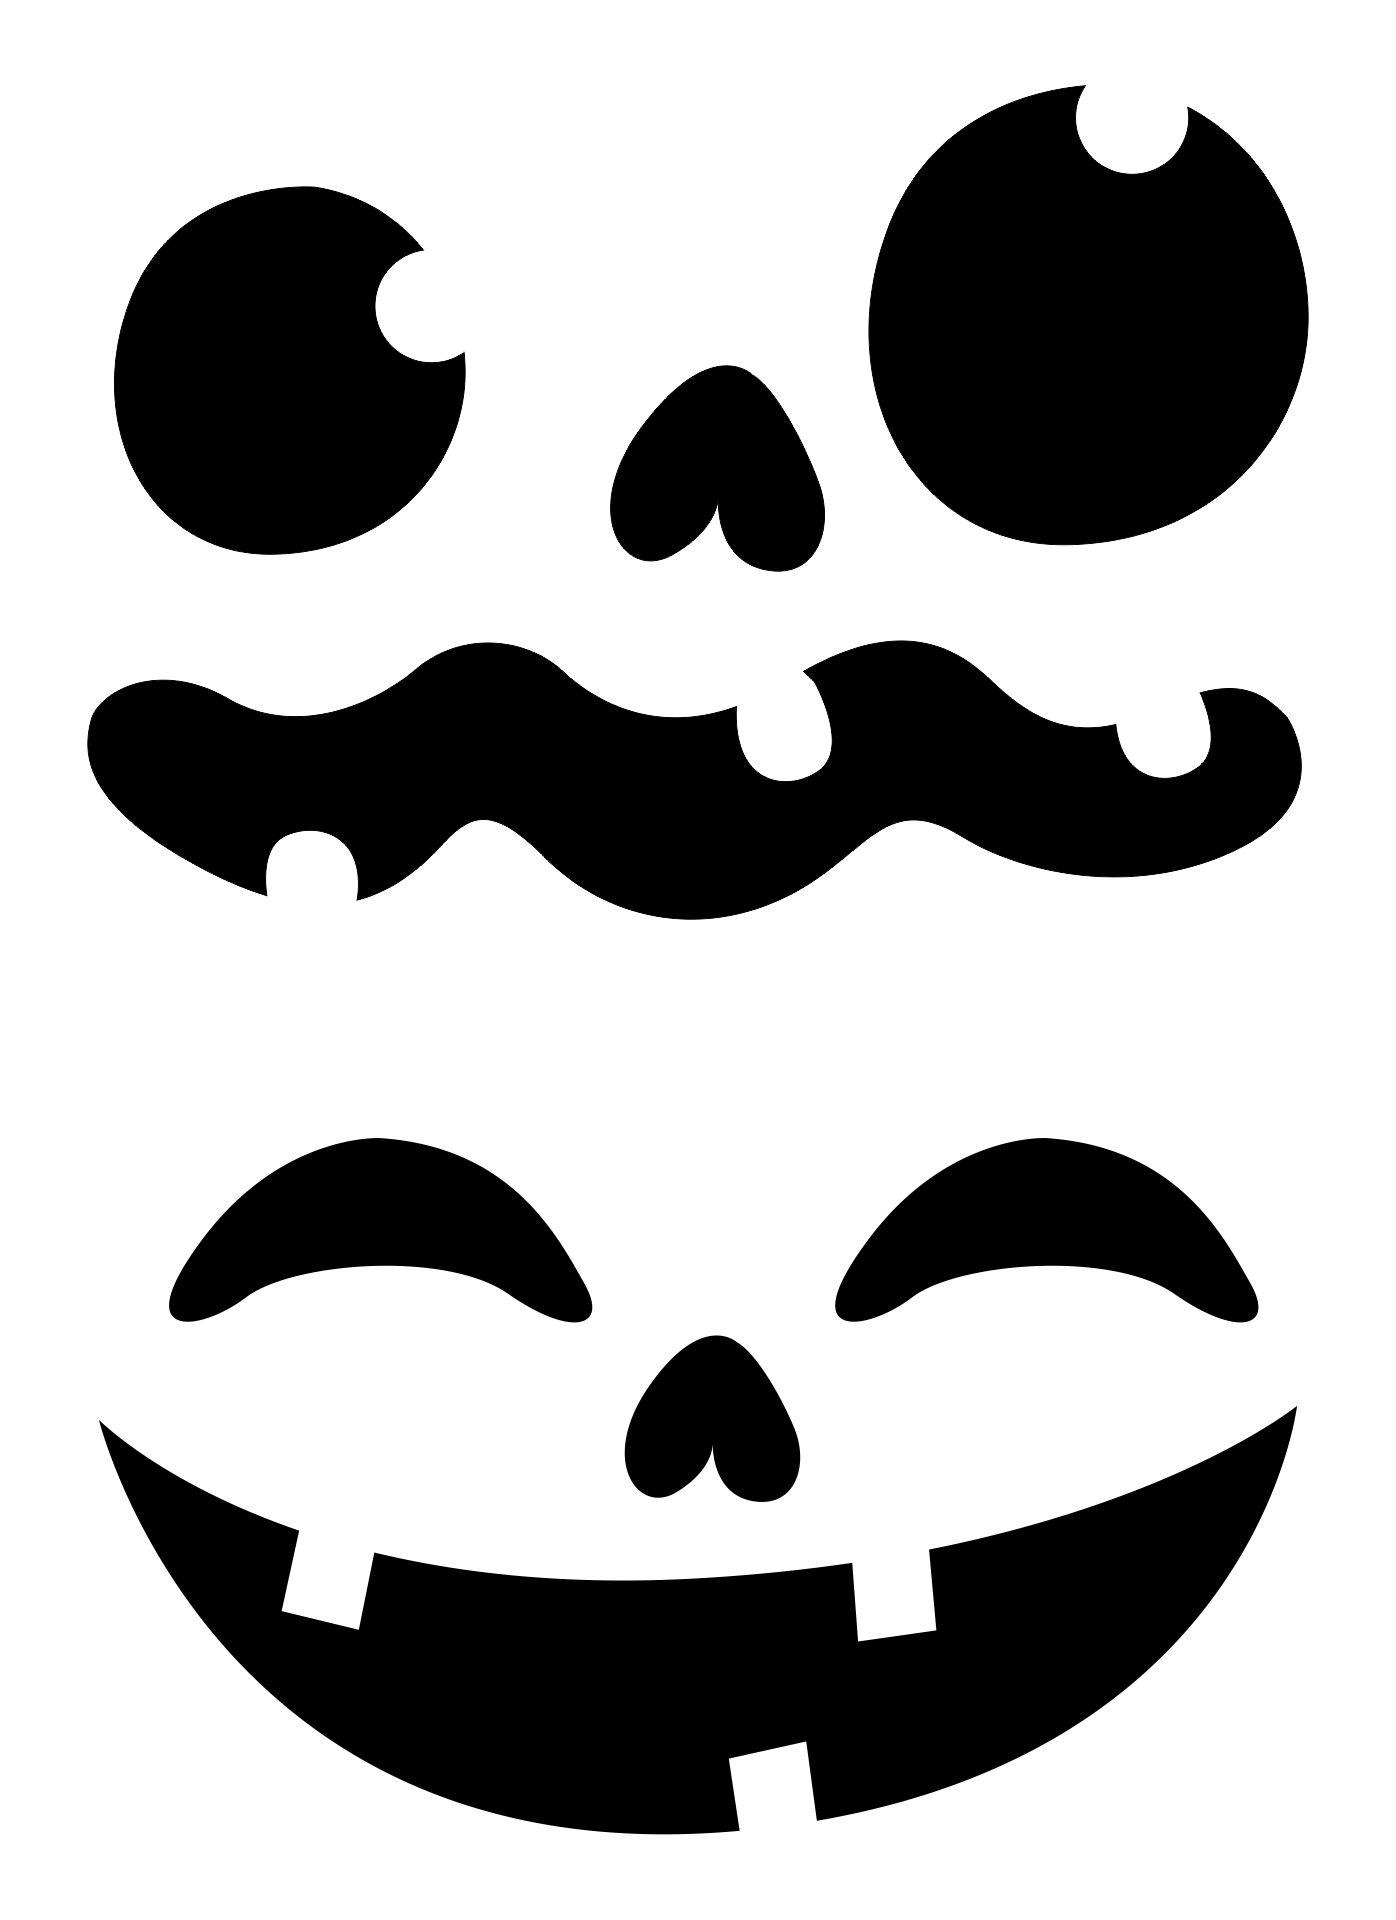 Printable Halloween Stencils For Pumpkins